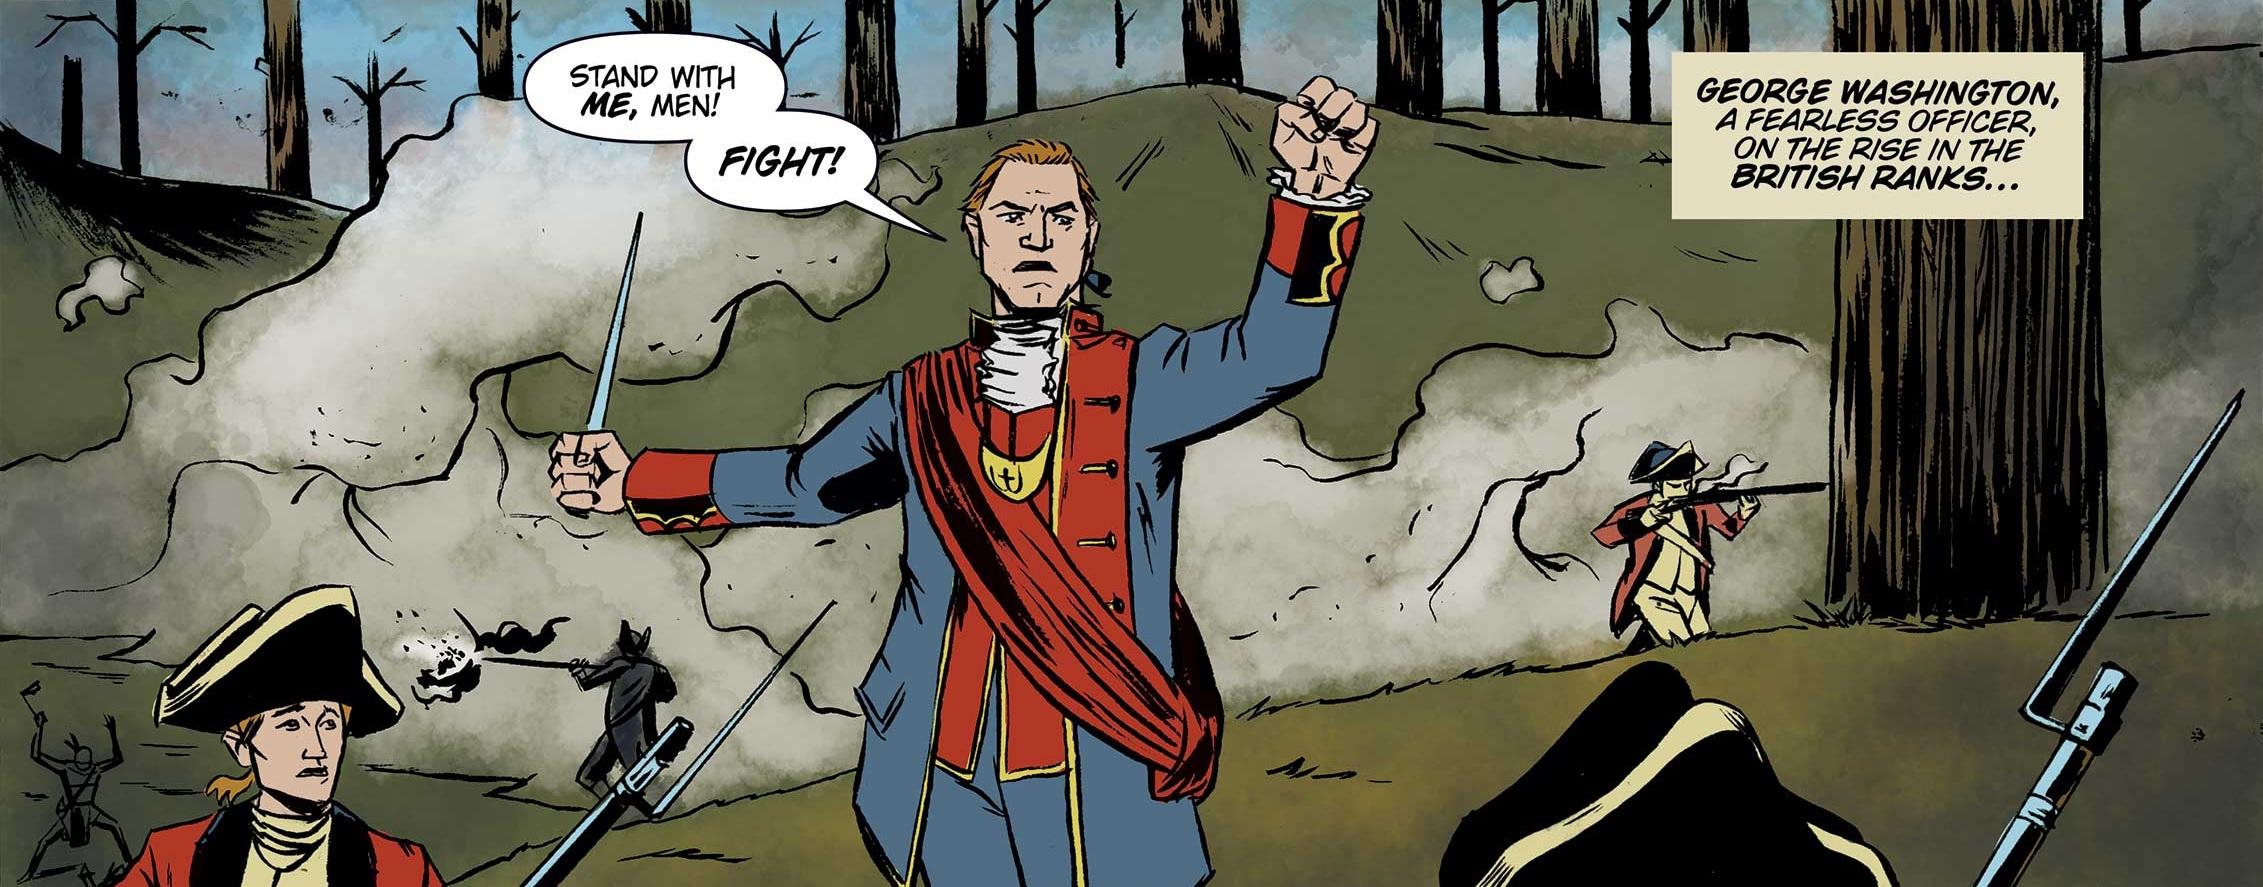 George_Washington_during_the_Battle_of_the_Monongahela.jpg